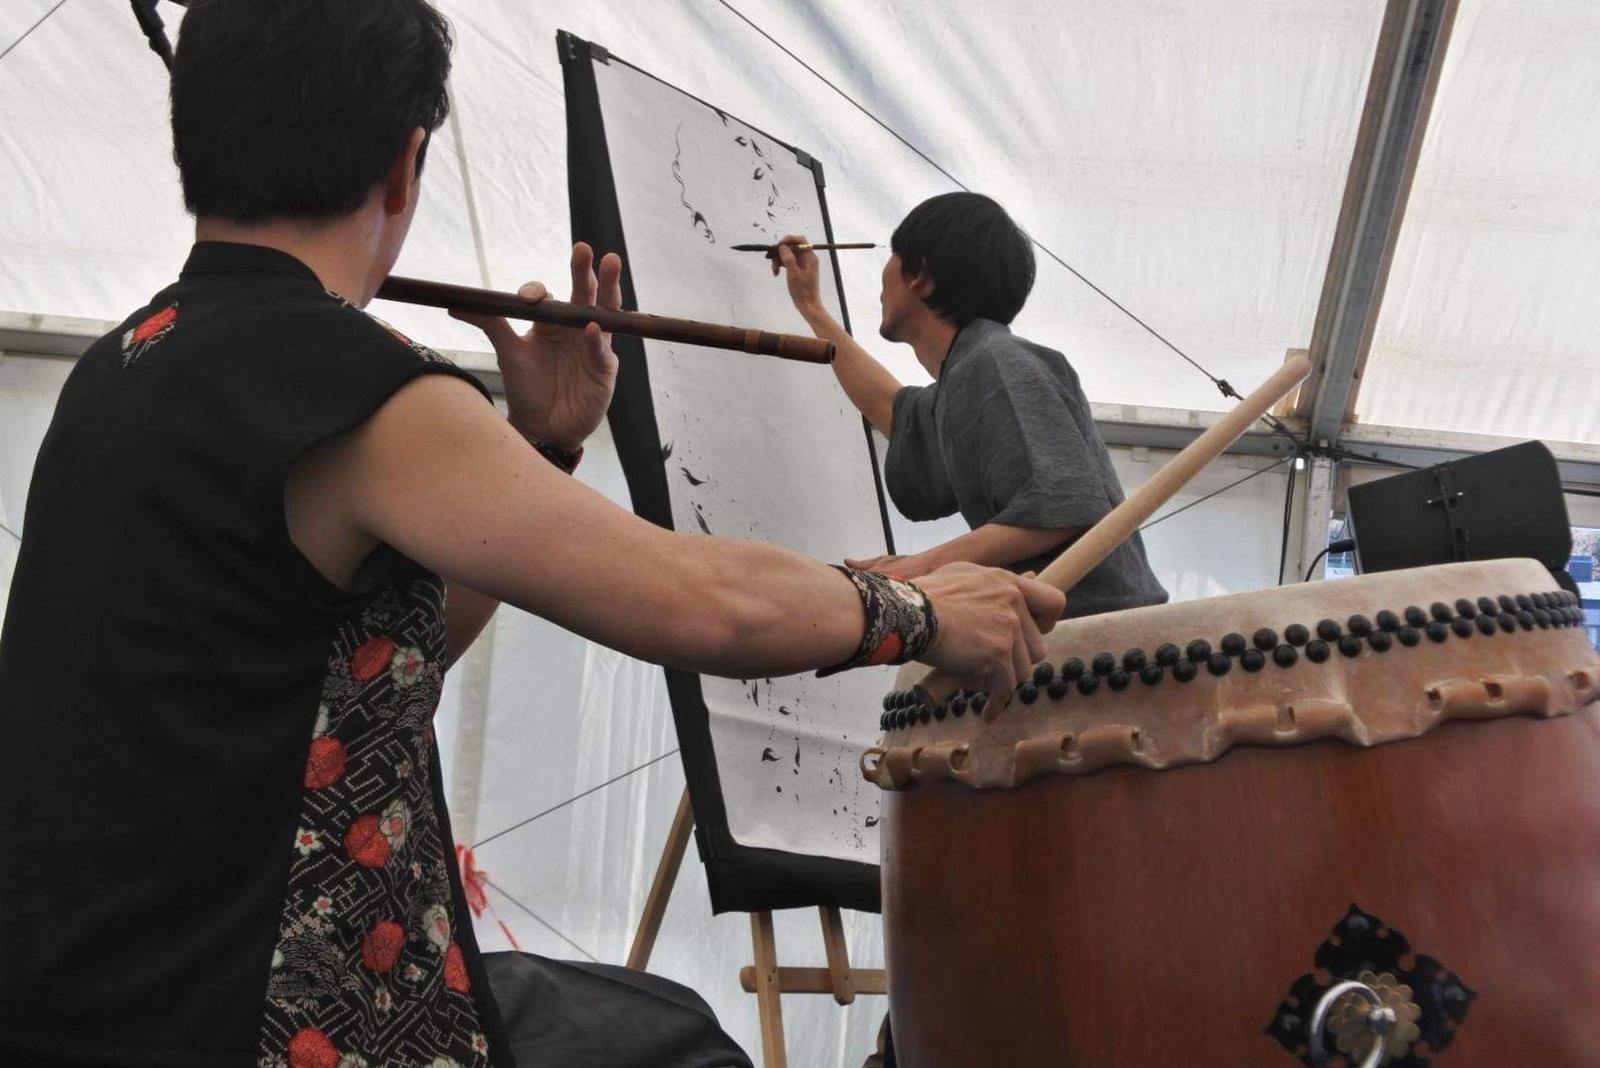 Keita Kanazashi y Mitsuru Nagata, Fiesta de la Primavera 2019, Andorra